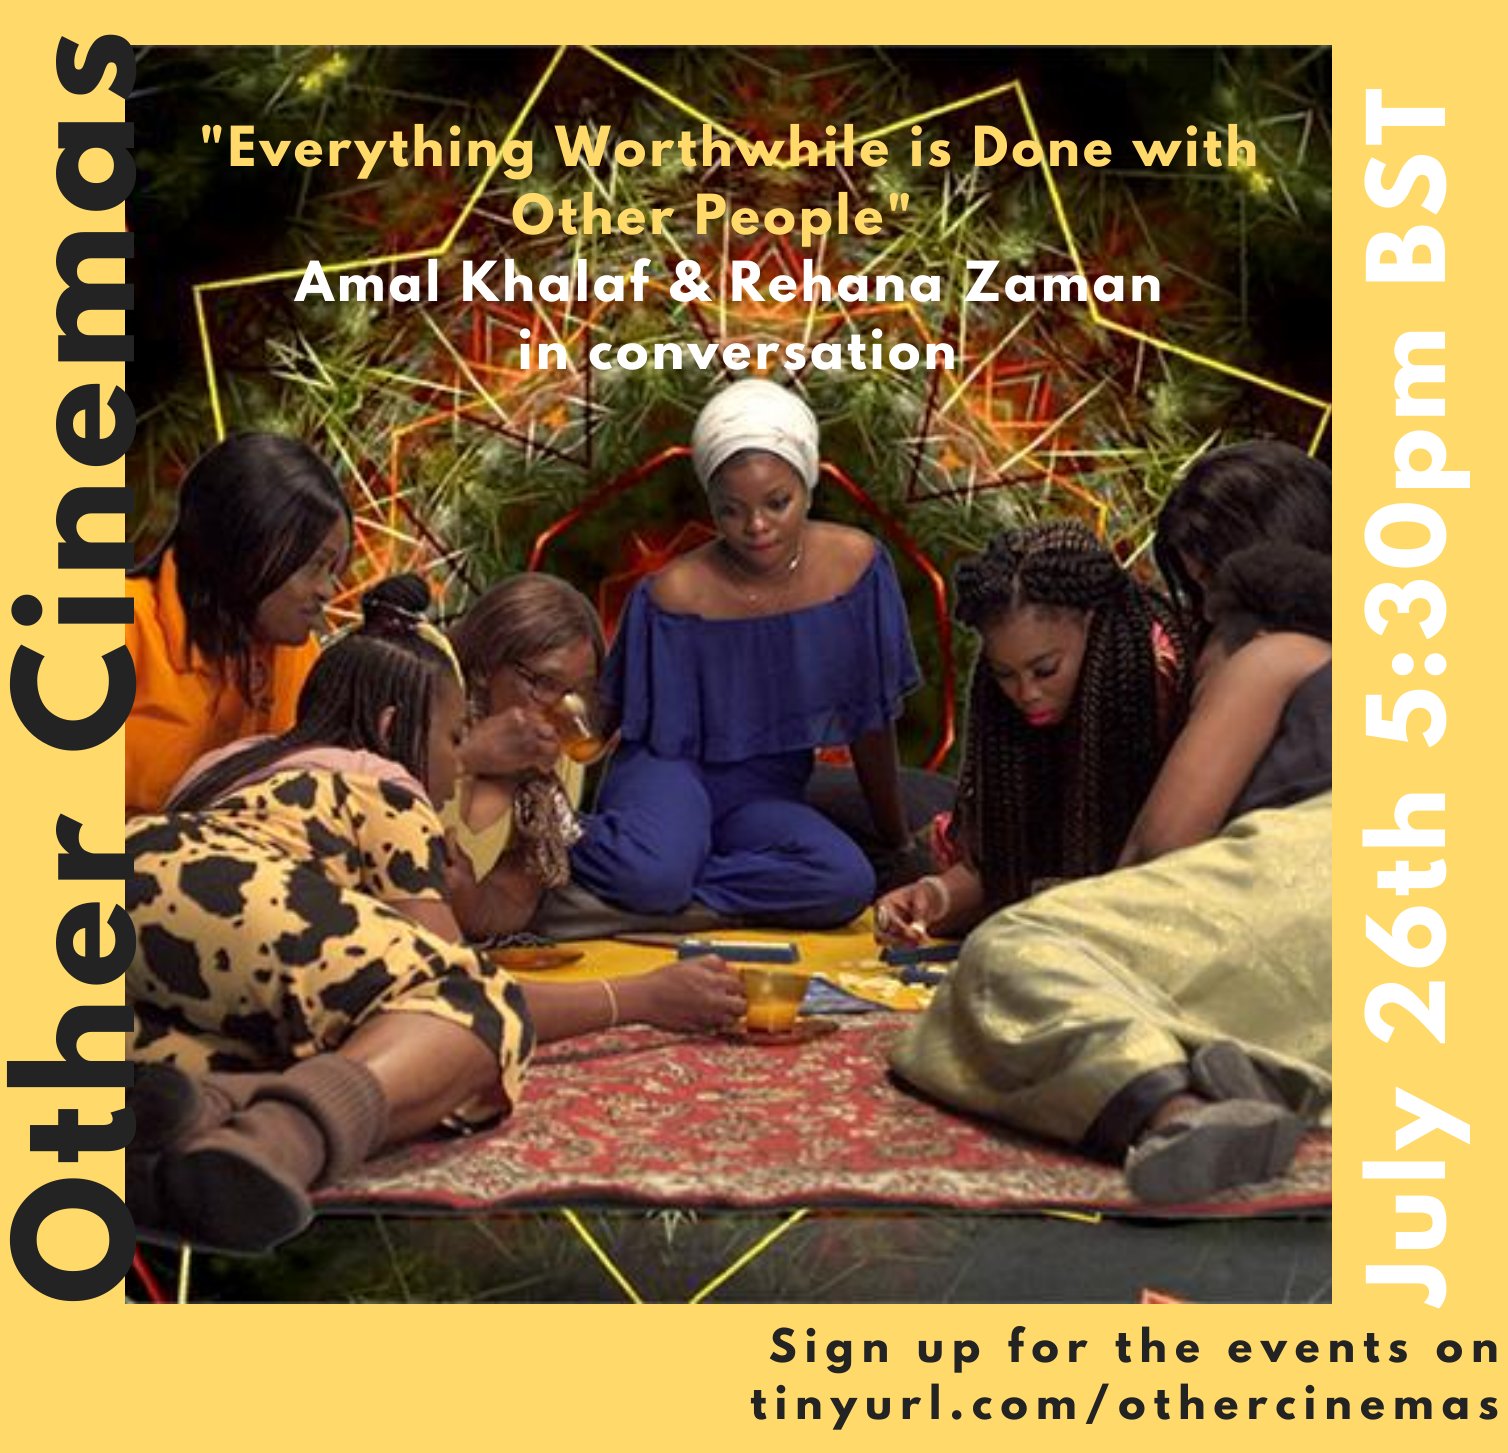 Amal Khalaf and Rehana Zaman in Conversation